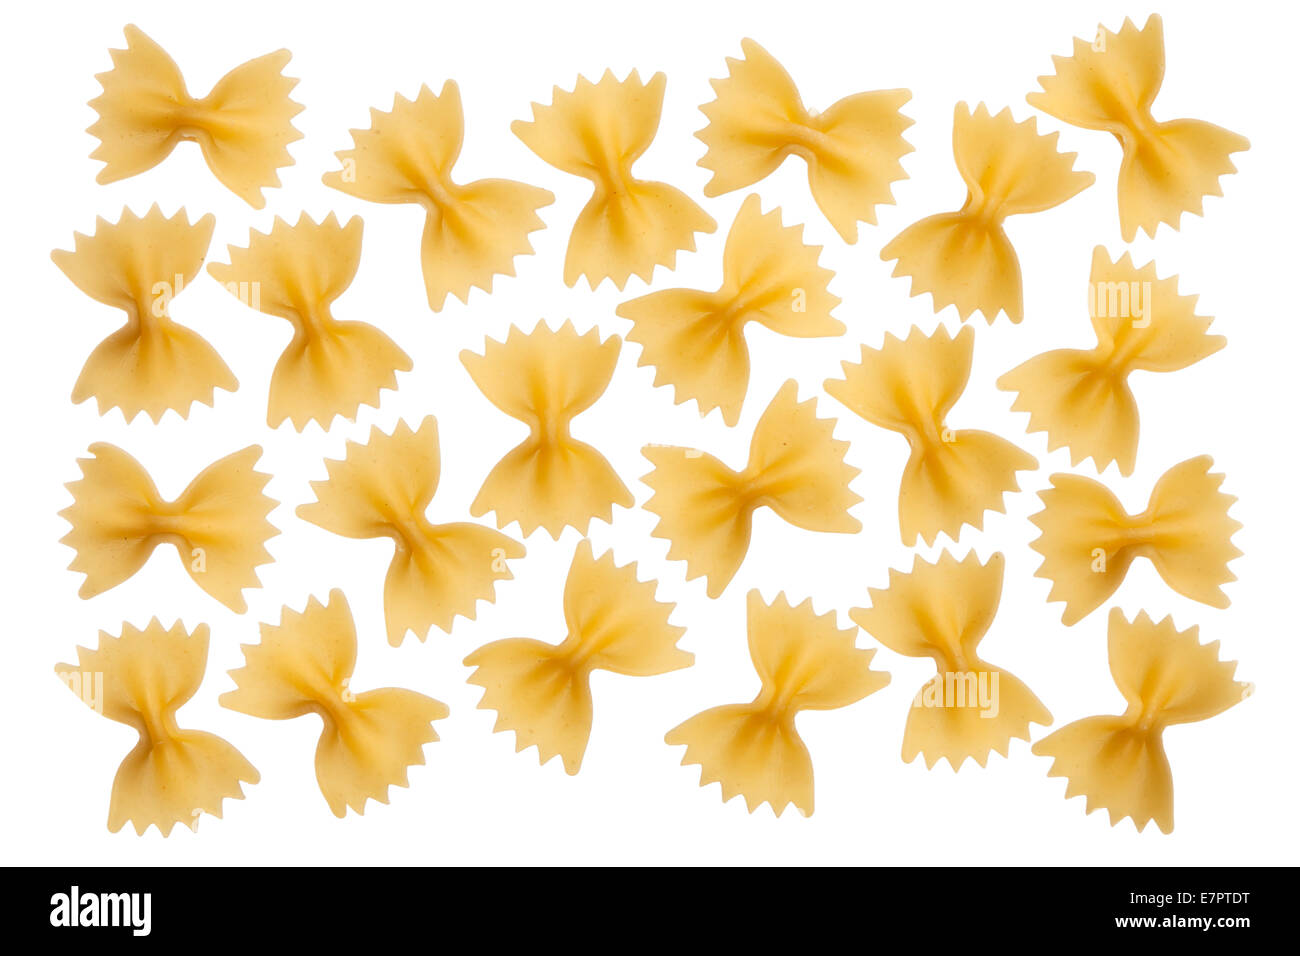 Raw italiano Pasta Farfalle, pajarita, mariposa Imagen De Stock